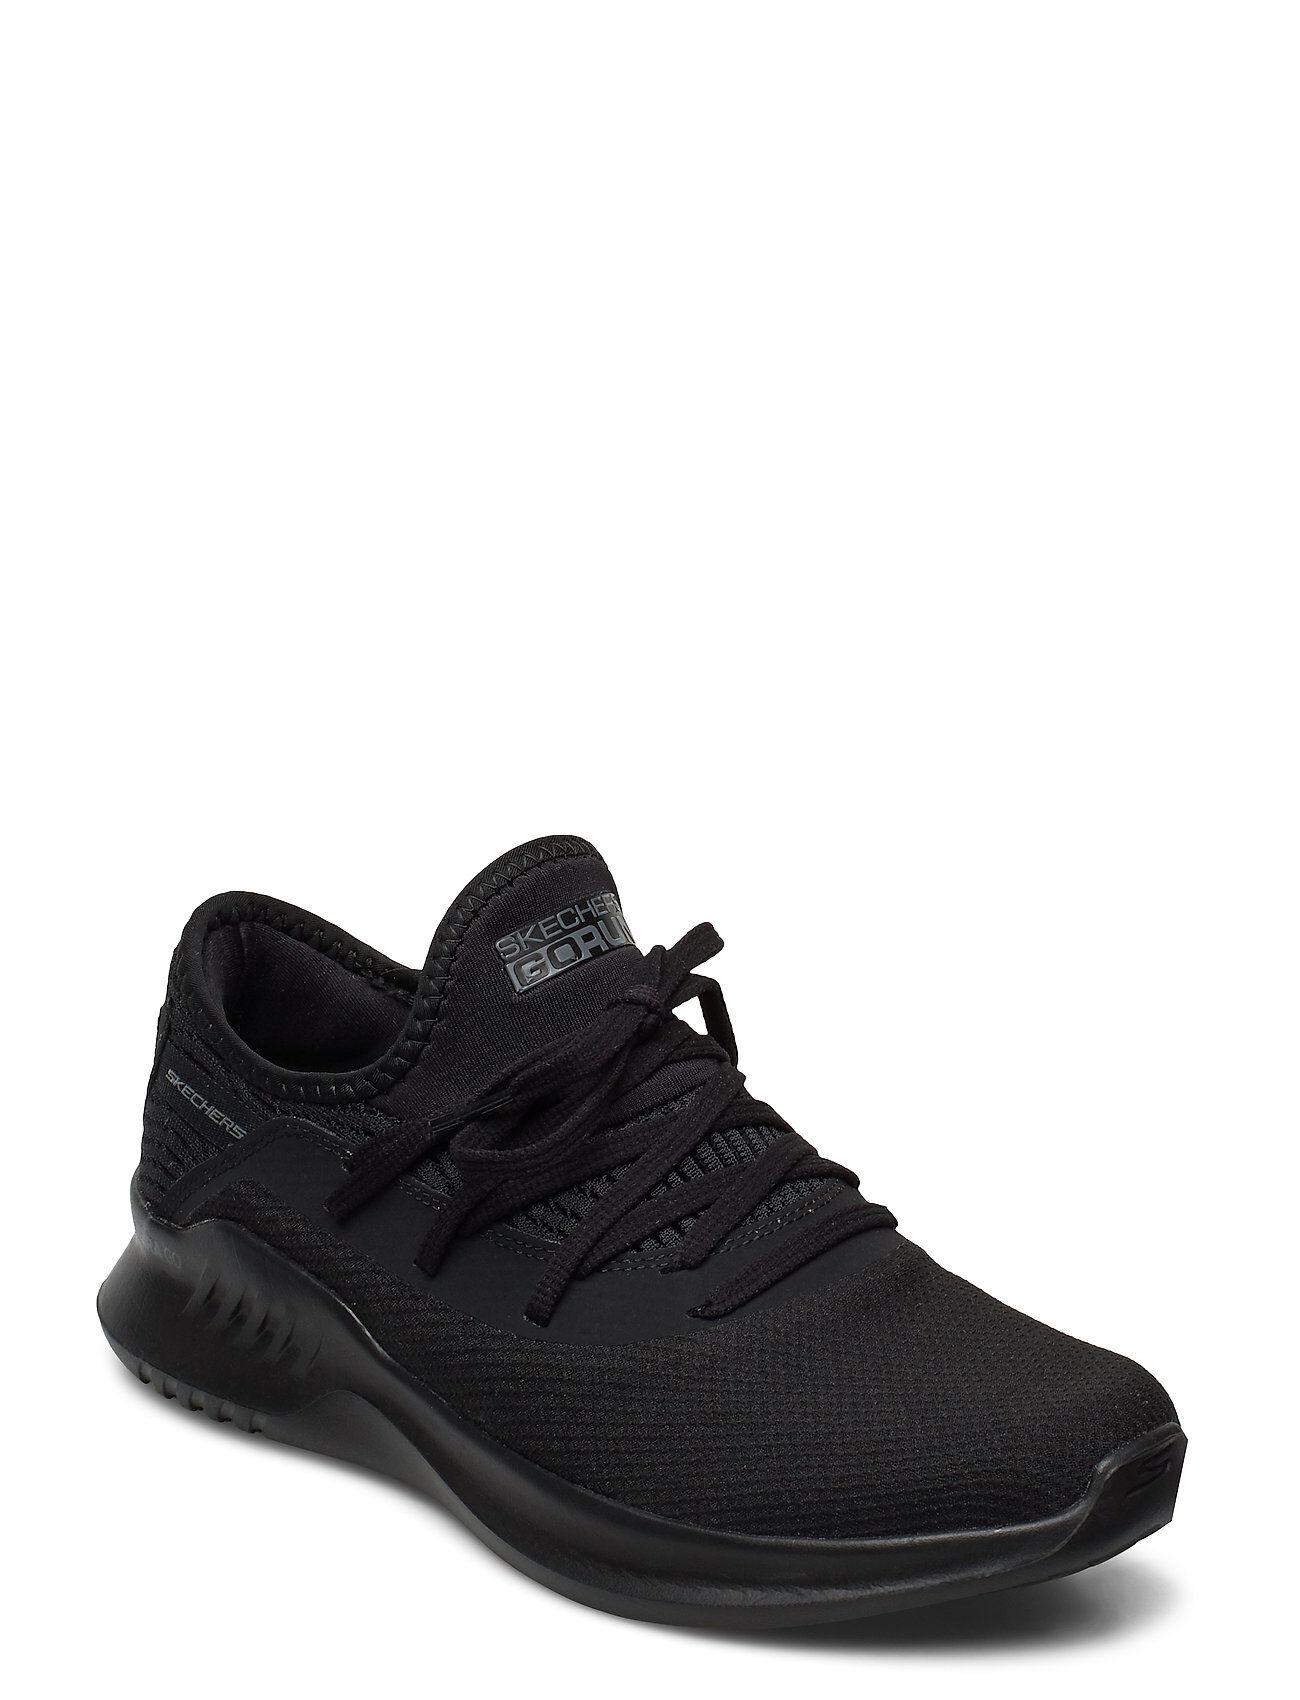 Skechers Womens Go Run Mojo 2.0 Matalavartiset Sneakerit Tennarit Musta Skechers